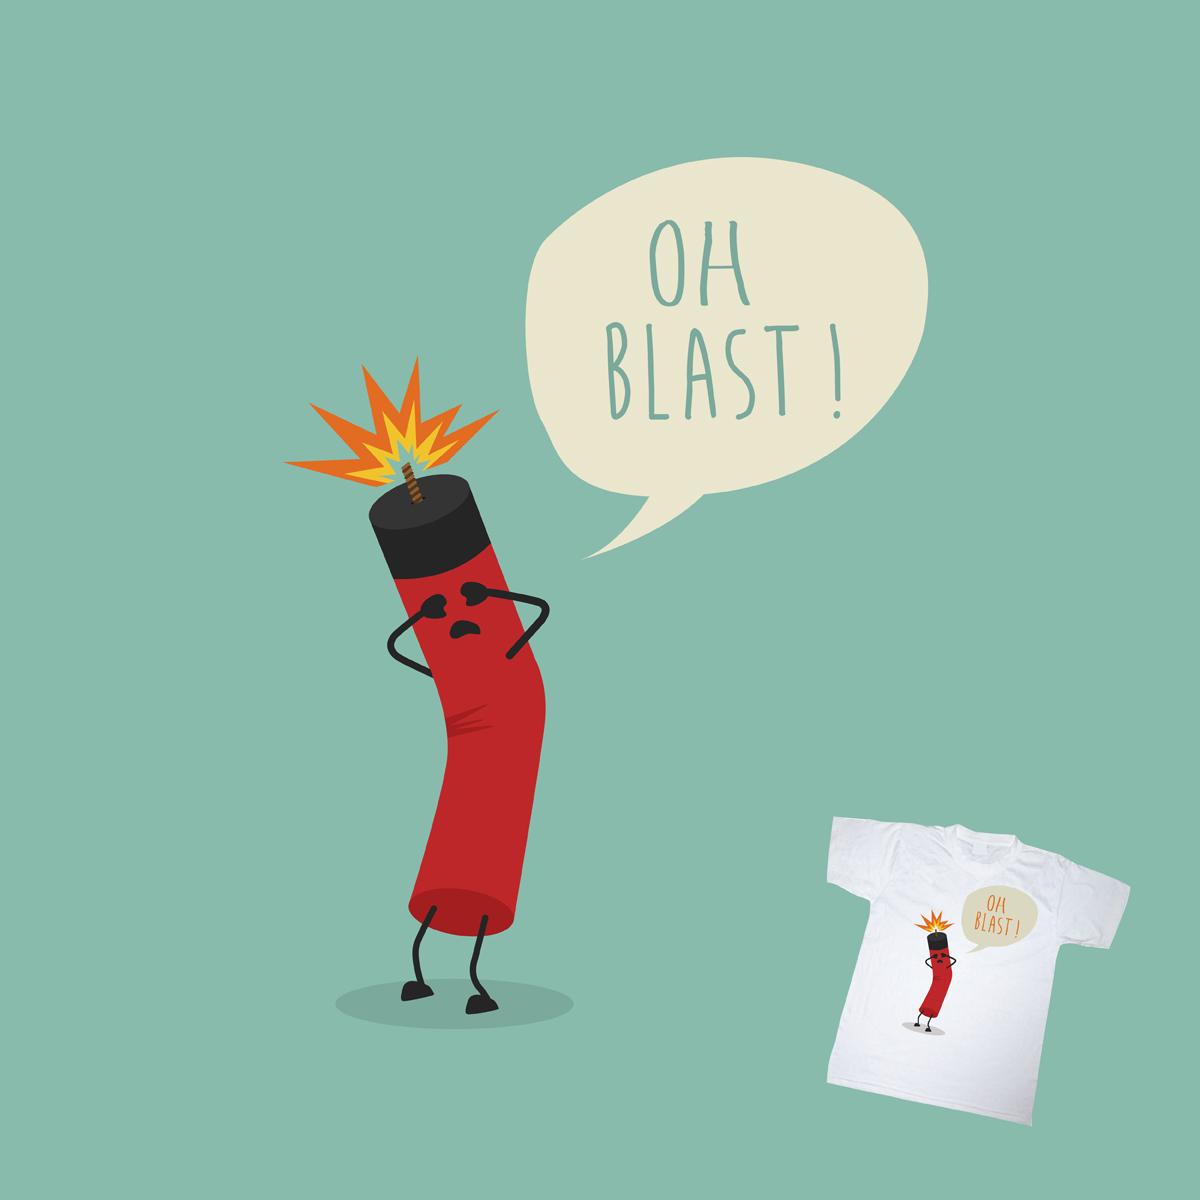 Oh Blast! by IanOHanlon on Threadless